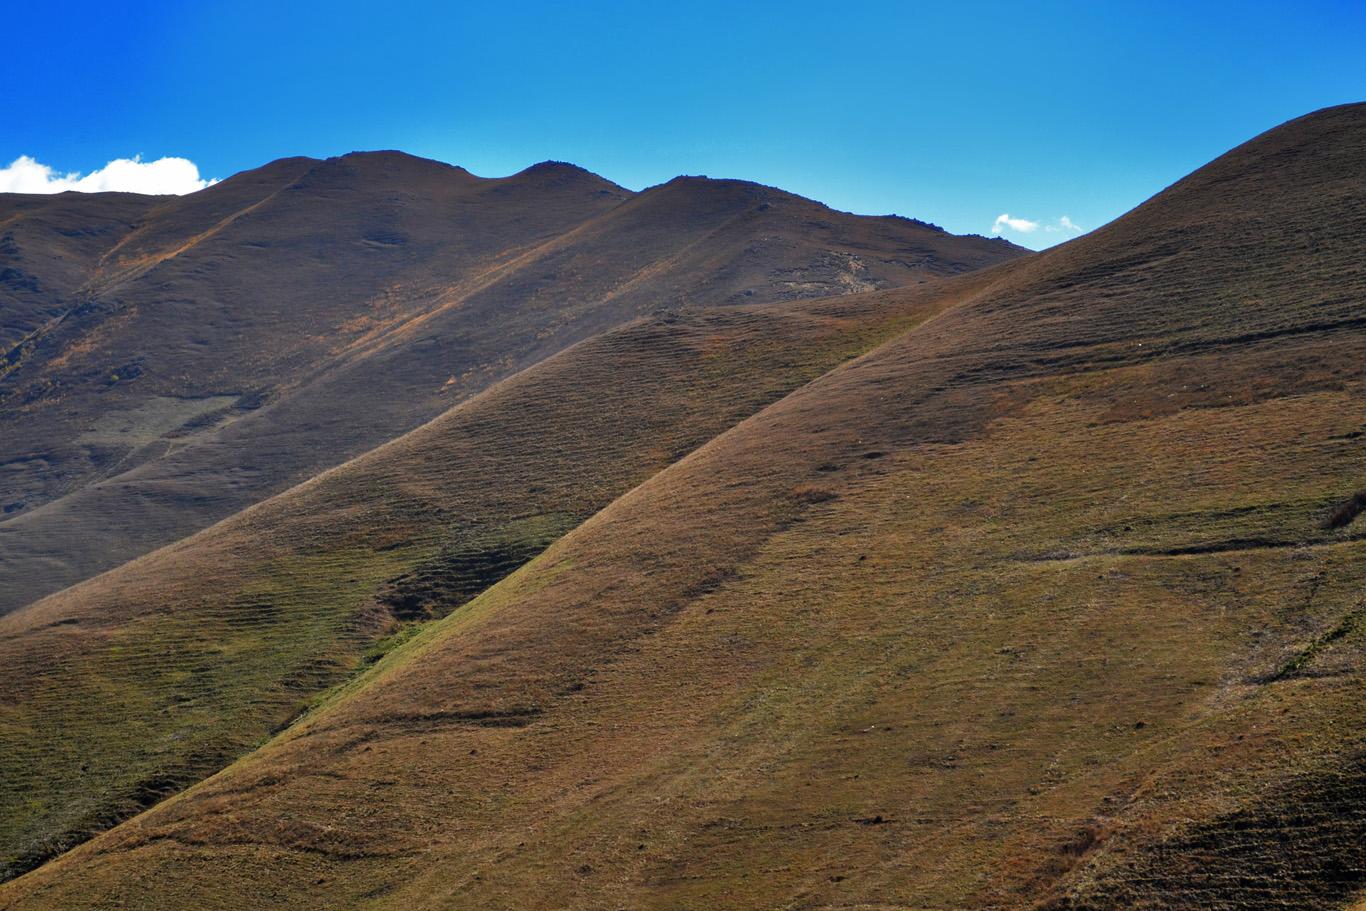 Bare mountains